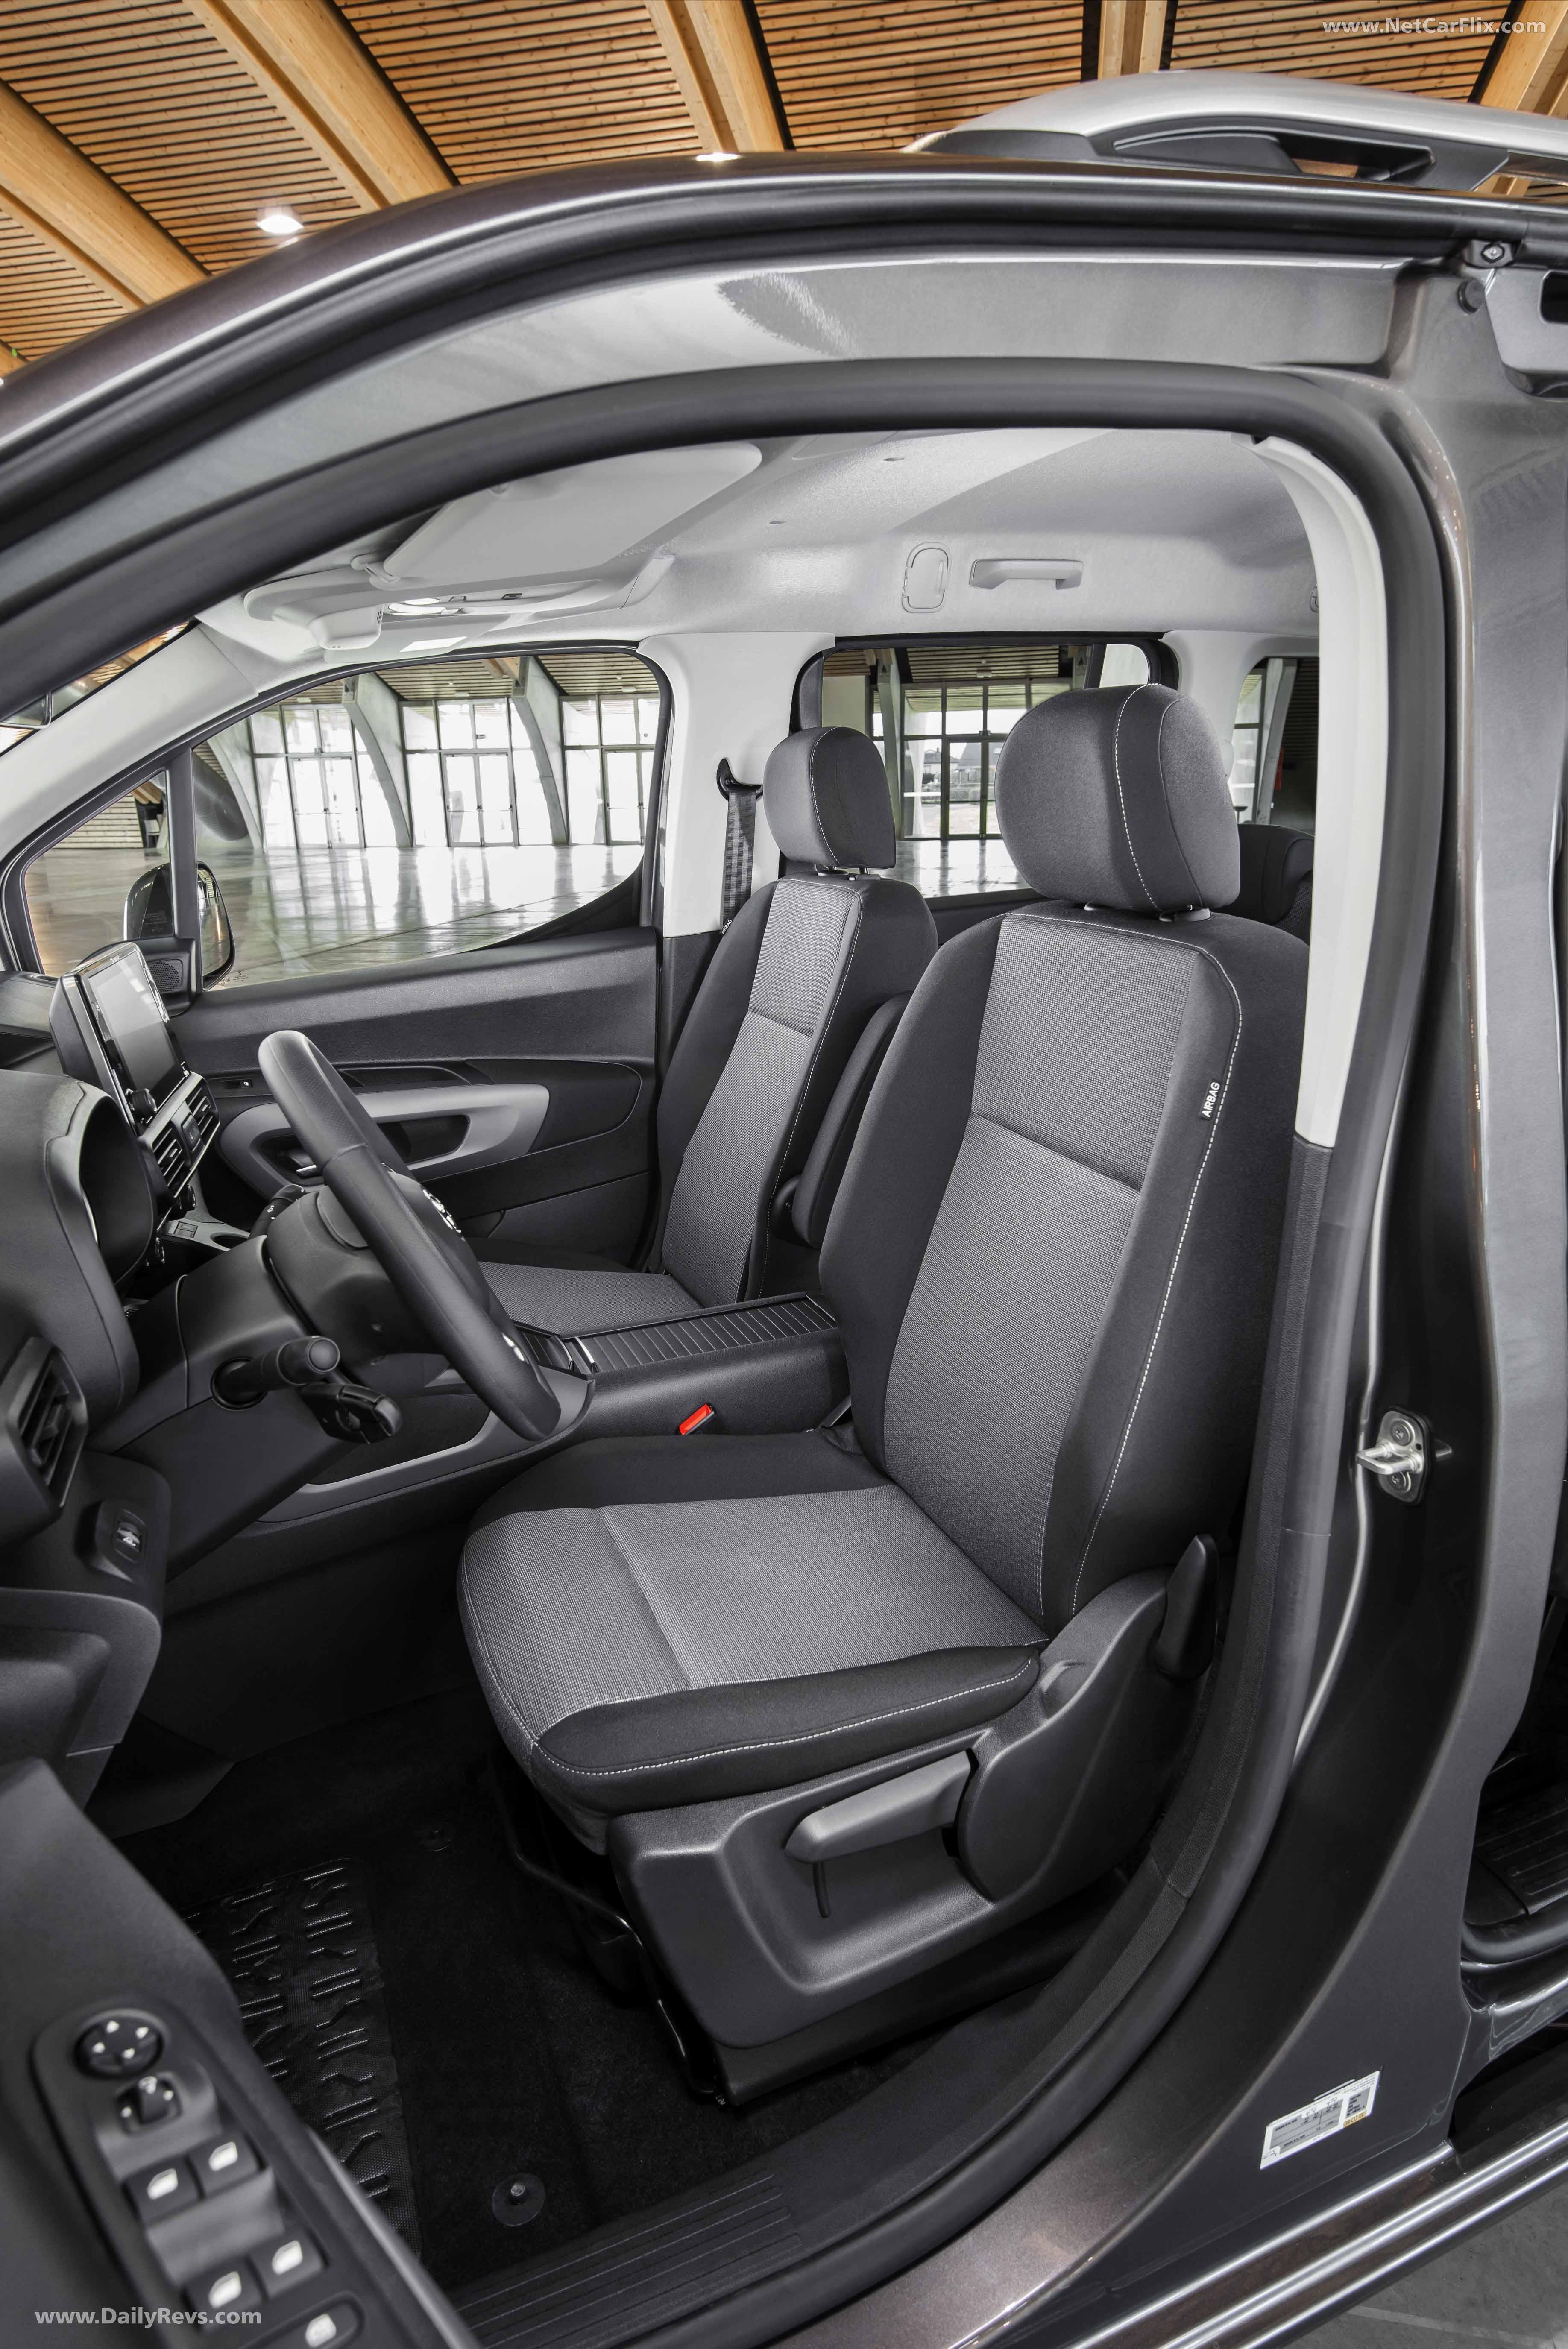 2020 Toyota ProAce City Verso - Dailyrevs